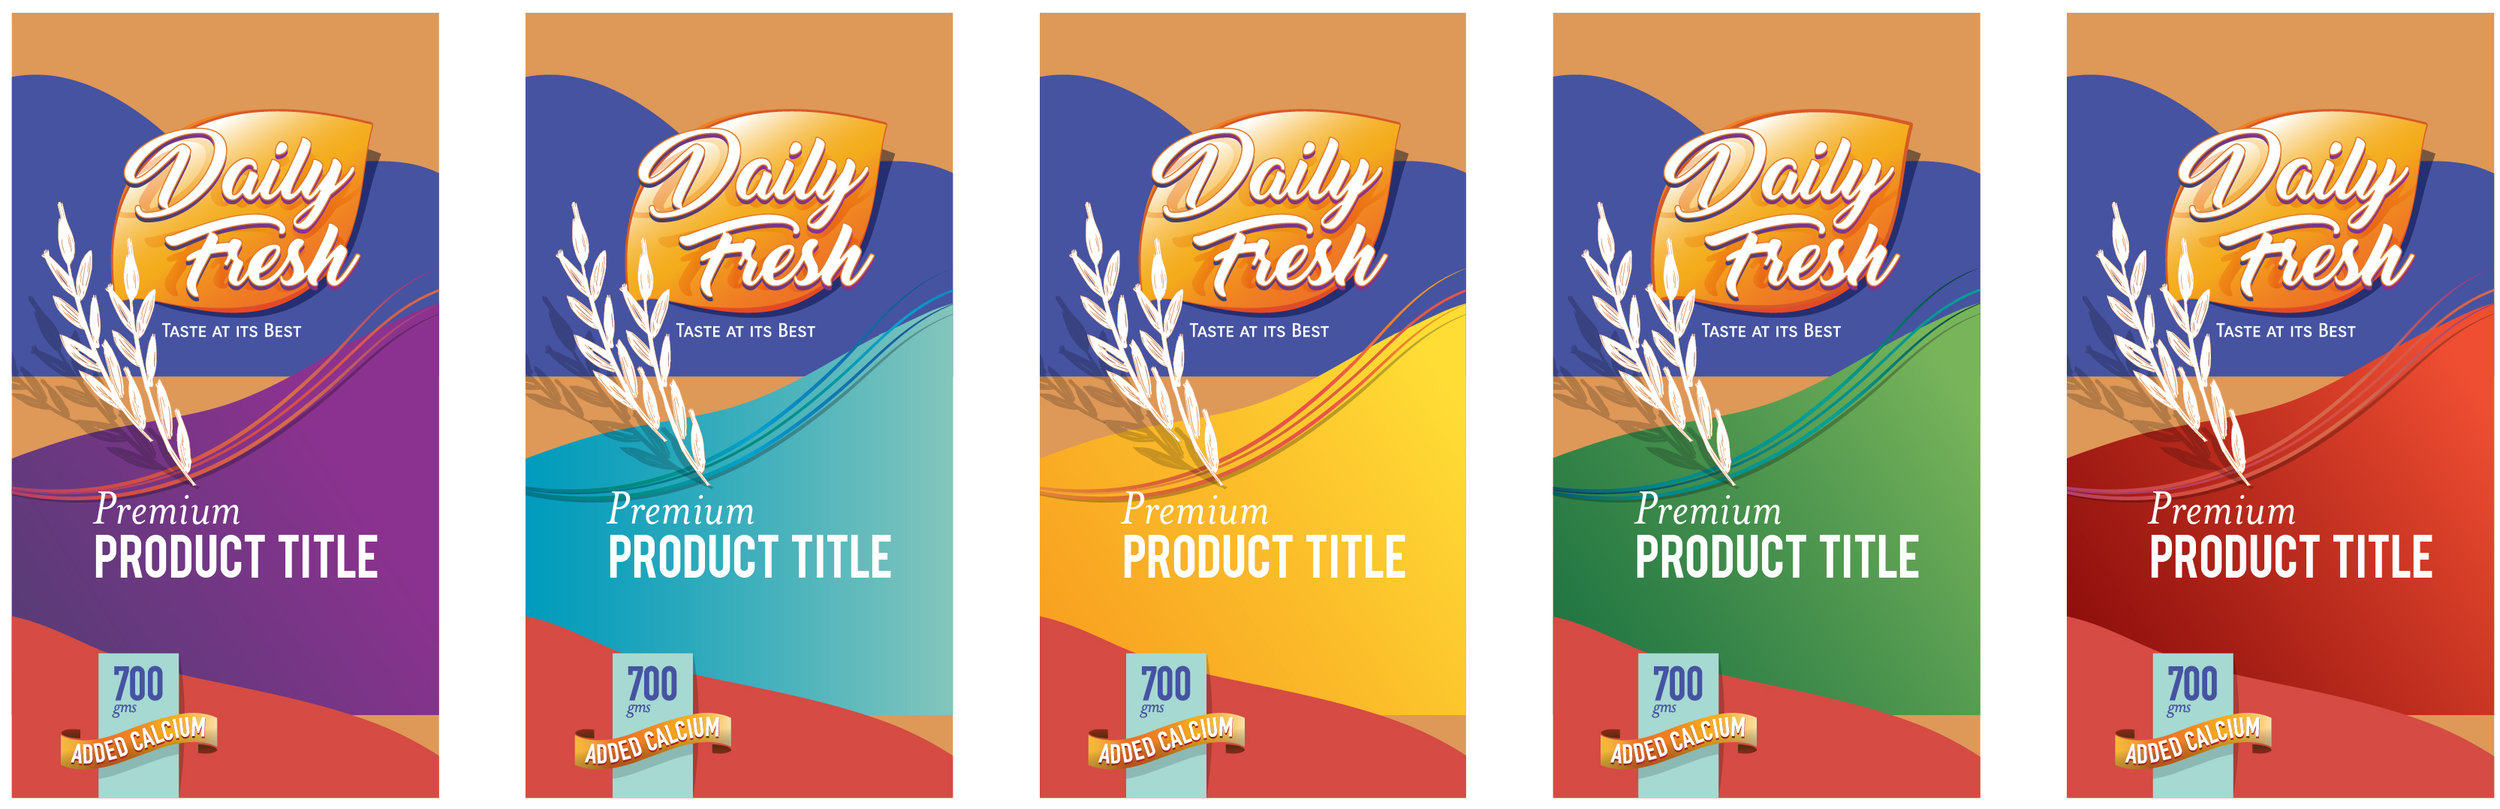 Daily Fresh_template-01.jpg